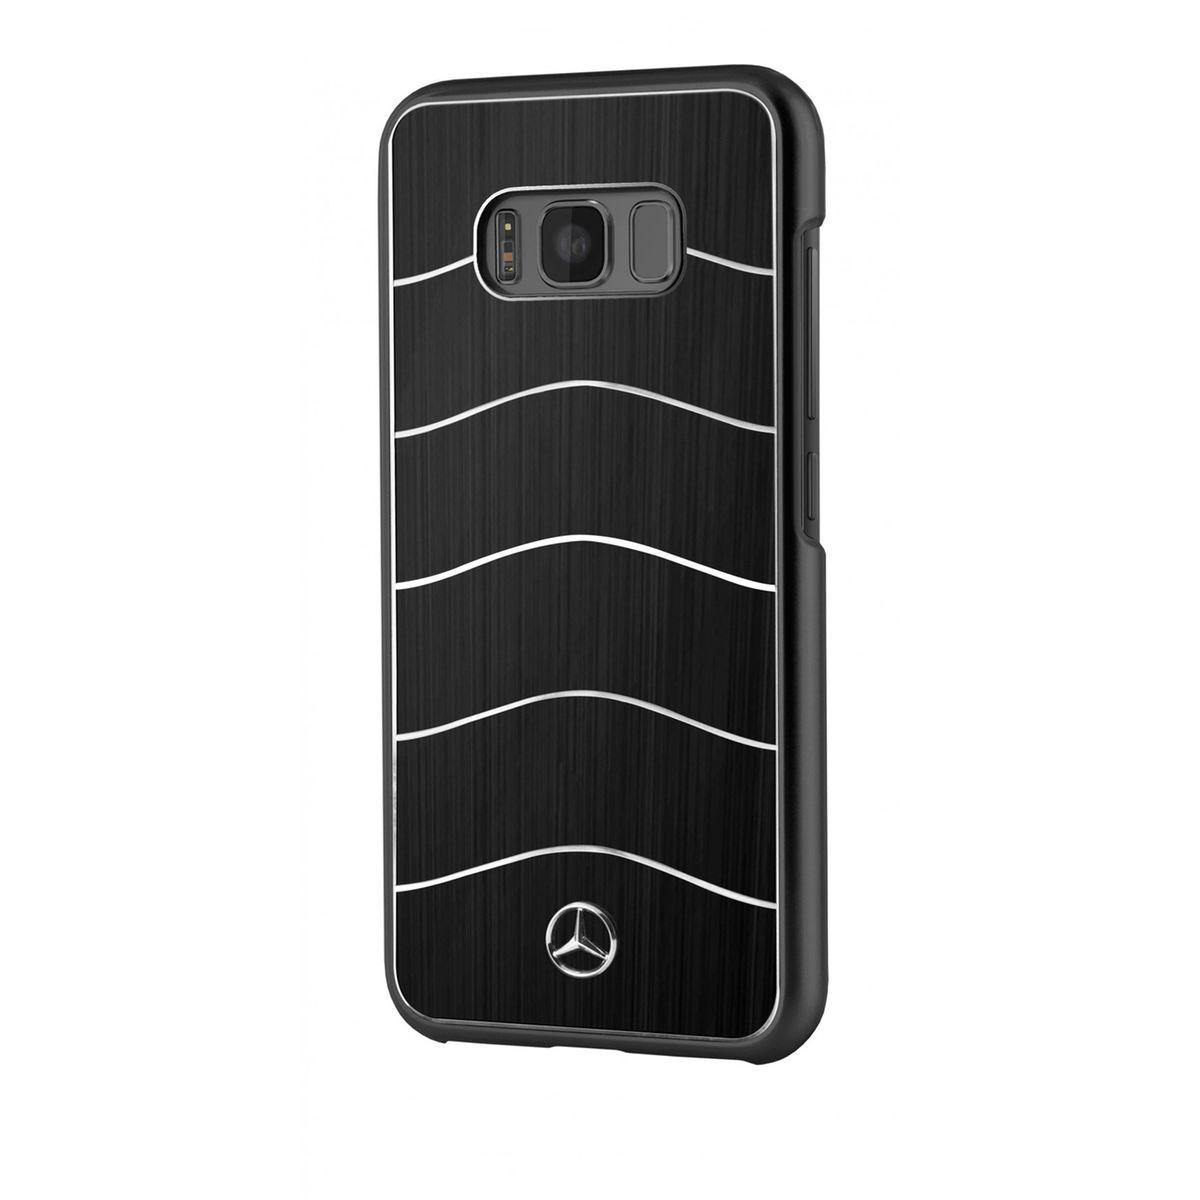 Coque 'wave Viii' Pour Galaxy S8 Alu Brossé